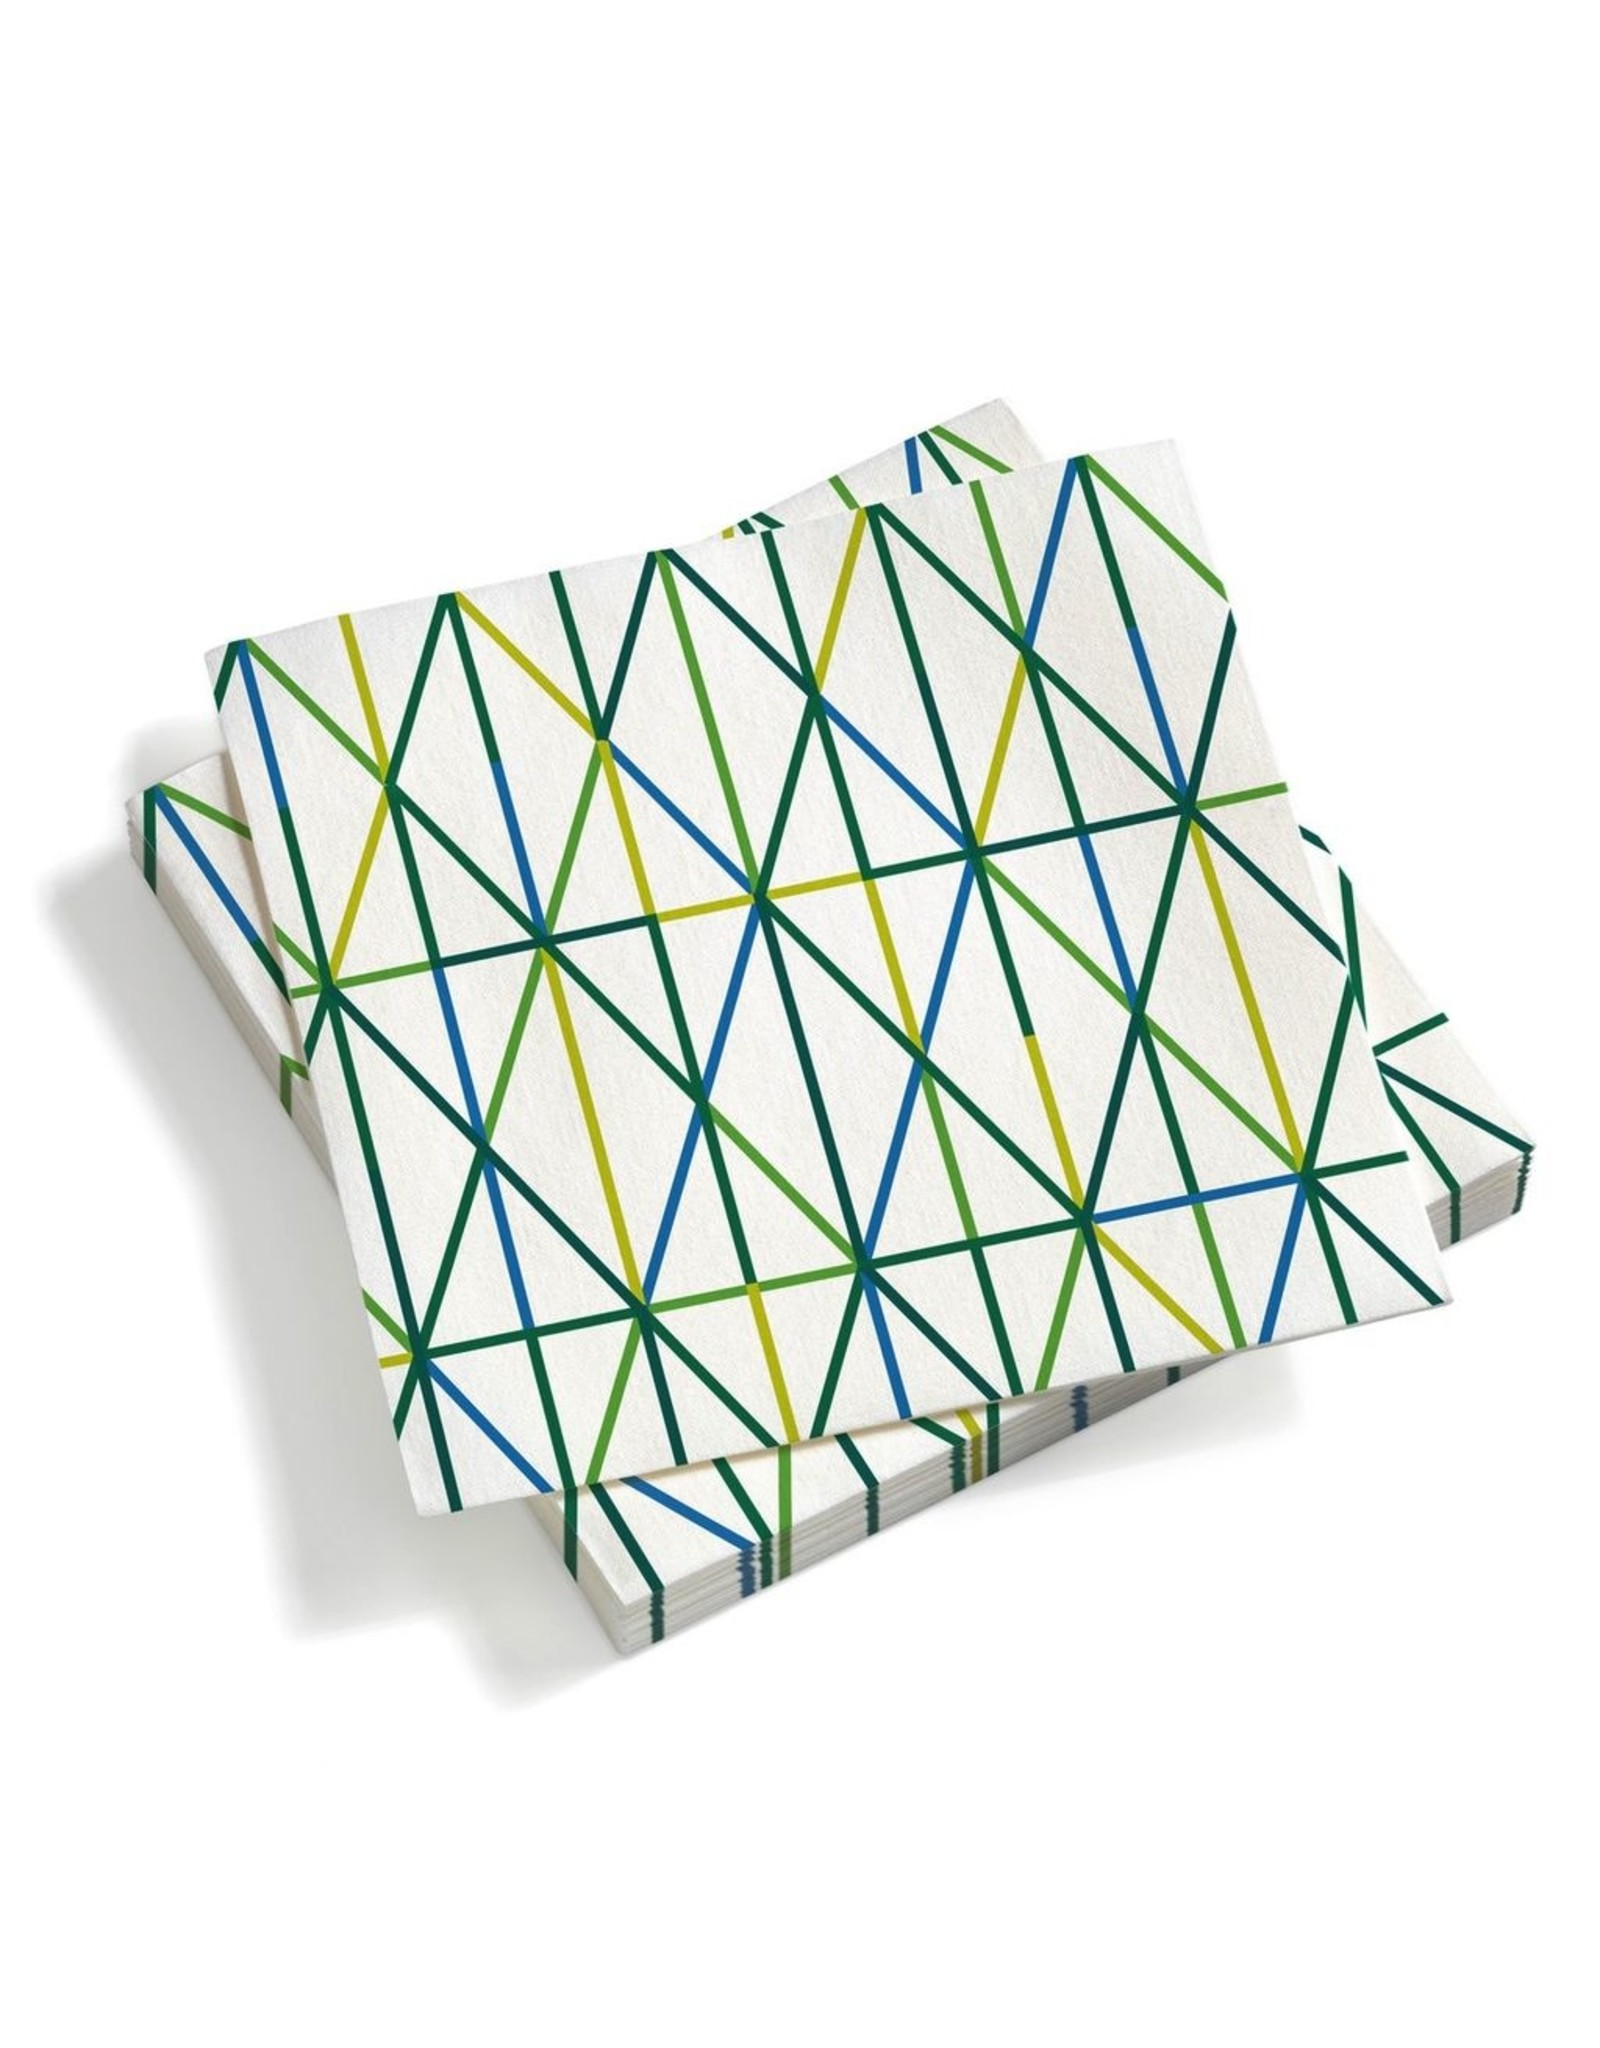 VITRA PAPER NAPKINS LARDE GRID/GREEN (12st)